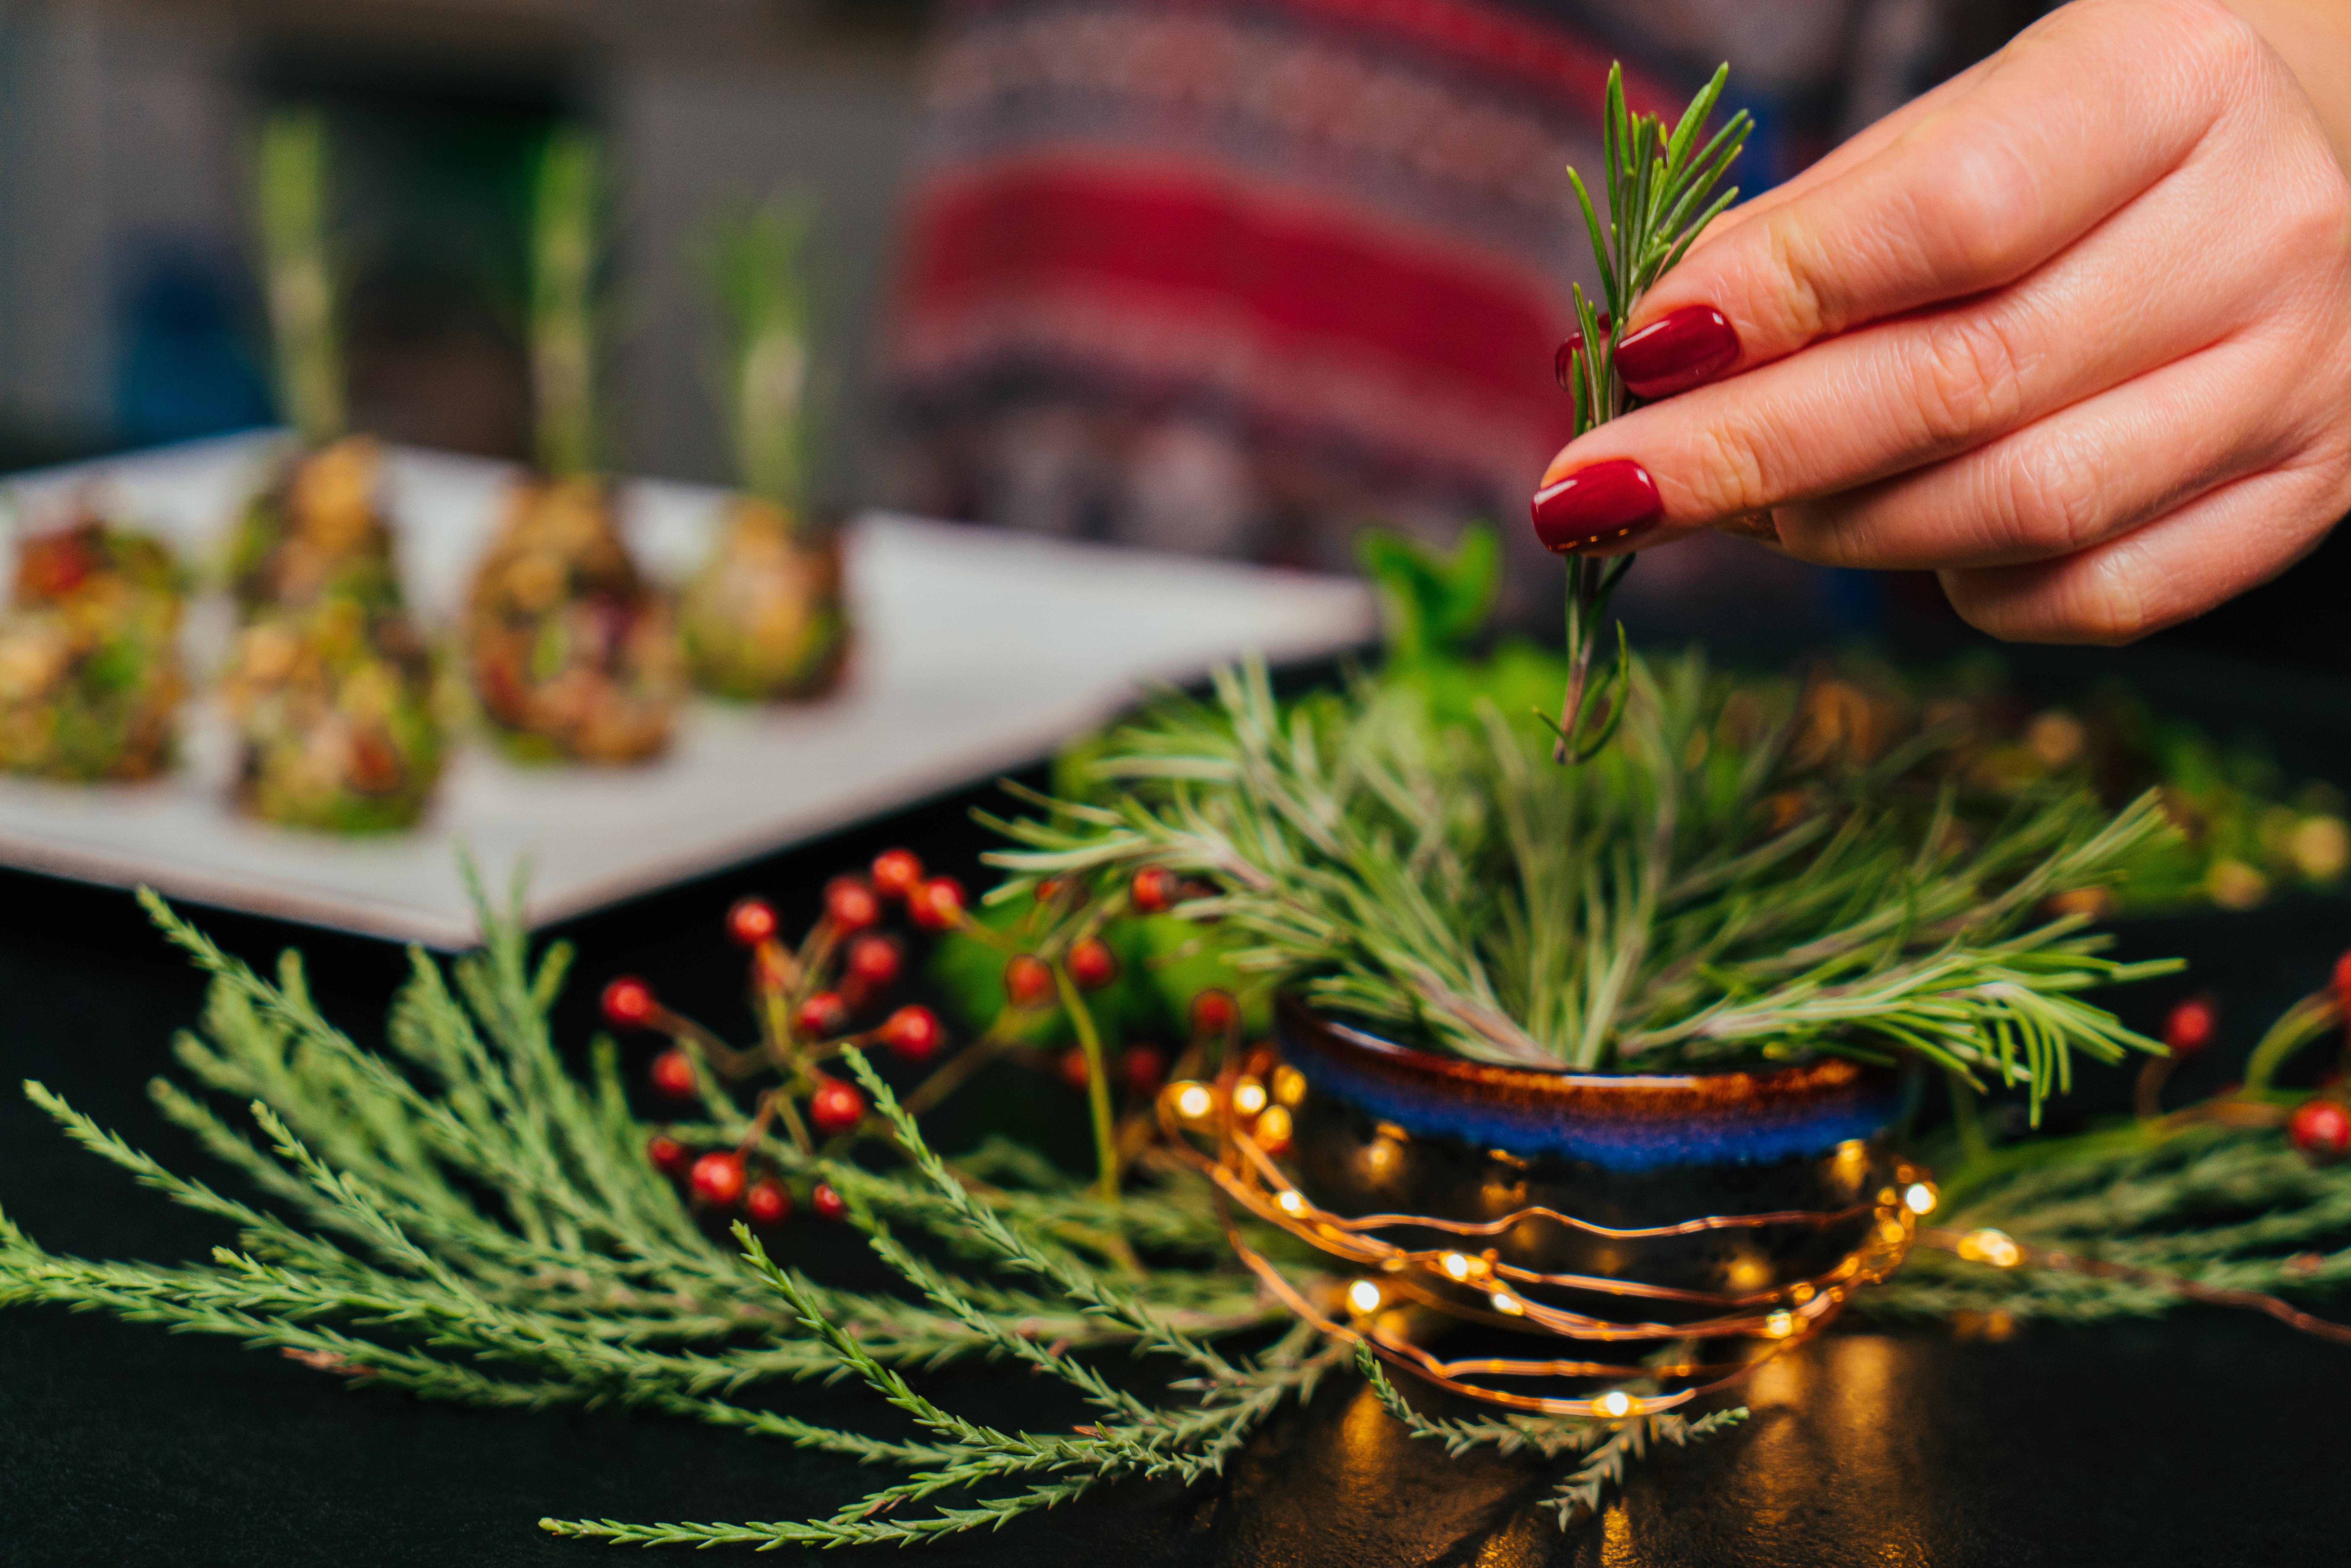 ramitas de romero fresco para decorar tus bocados navideños, canapés navideños fáciles y rápidos paso a paso en fotos